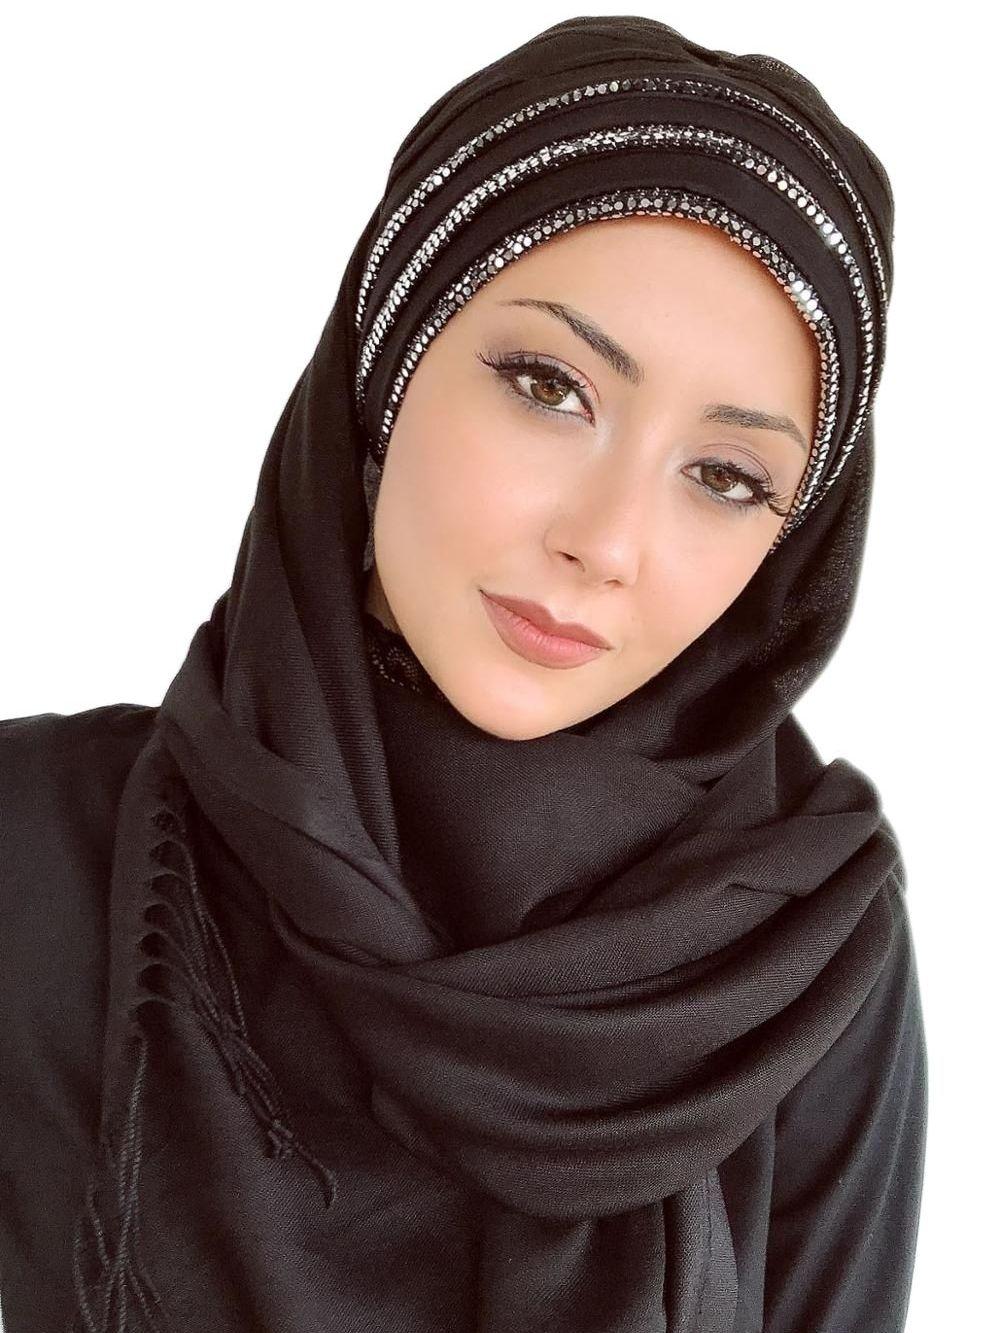 Yeni Moda-حجاب ، 2021 ، kadеn Müslüman ، baashourtüsجيلو إيسلامي كيليافت t0.rban سيابكا فولar esharp Bone atkeh siya Renk ramieli r schal